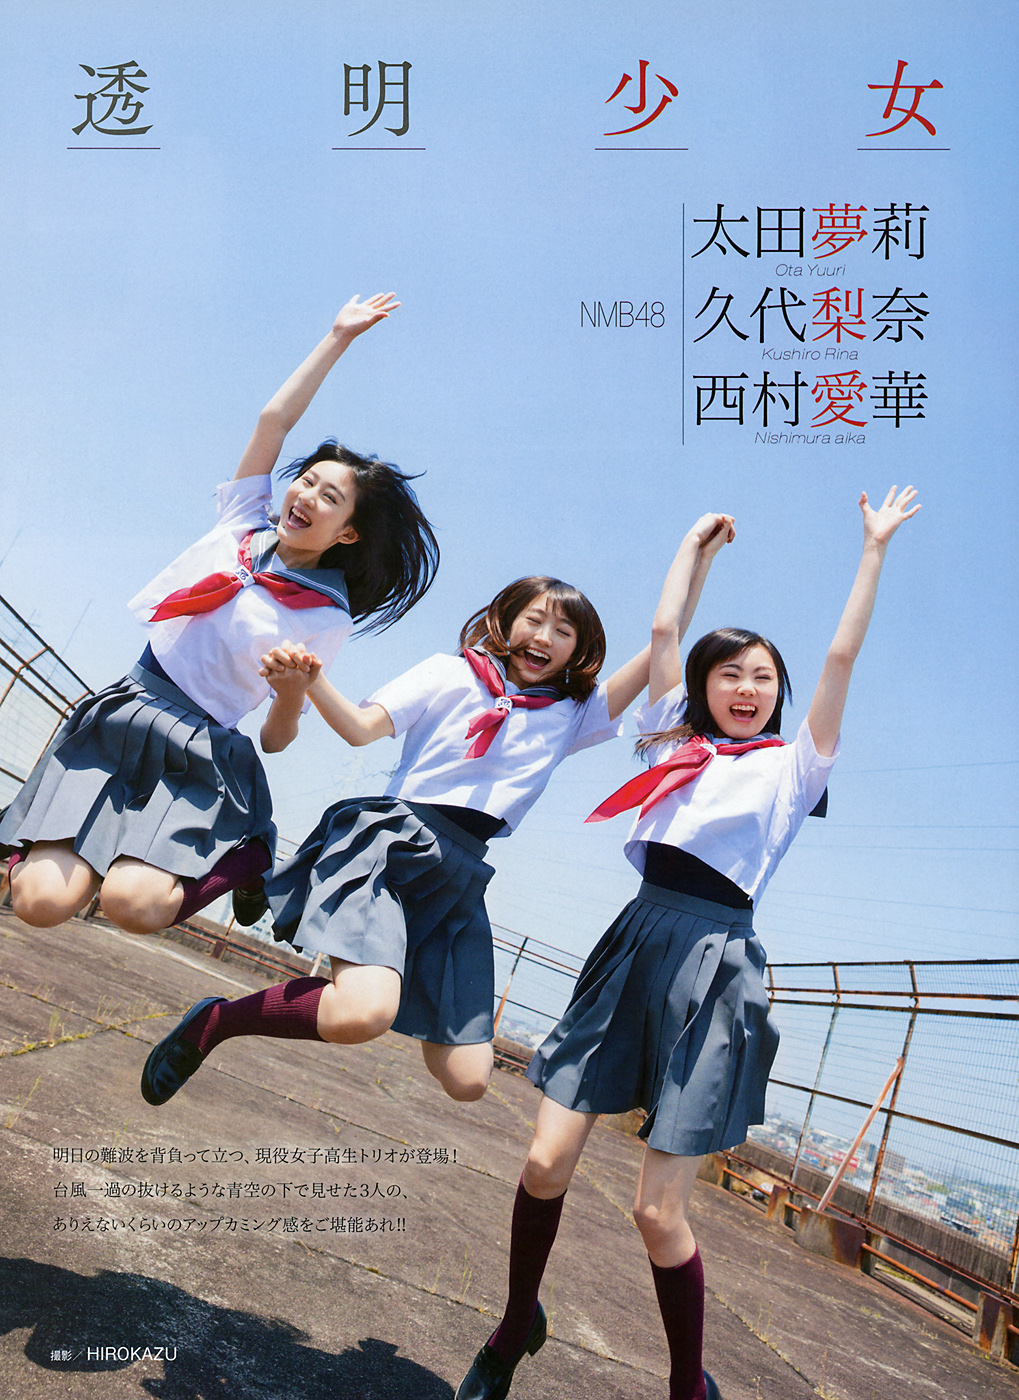 Ota Yuuri 太田夢莉, Kushiro Rina 久代梨奈, Nishimura Aika 西村愛華 NMB48, ENTAME 2015.11 (エンタメ 2015年11月号)